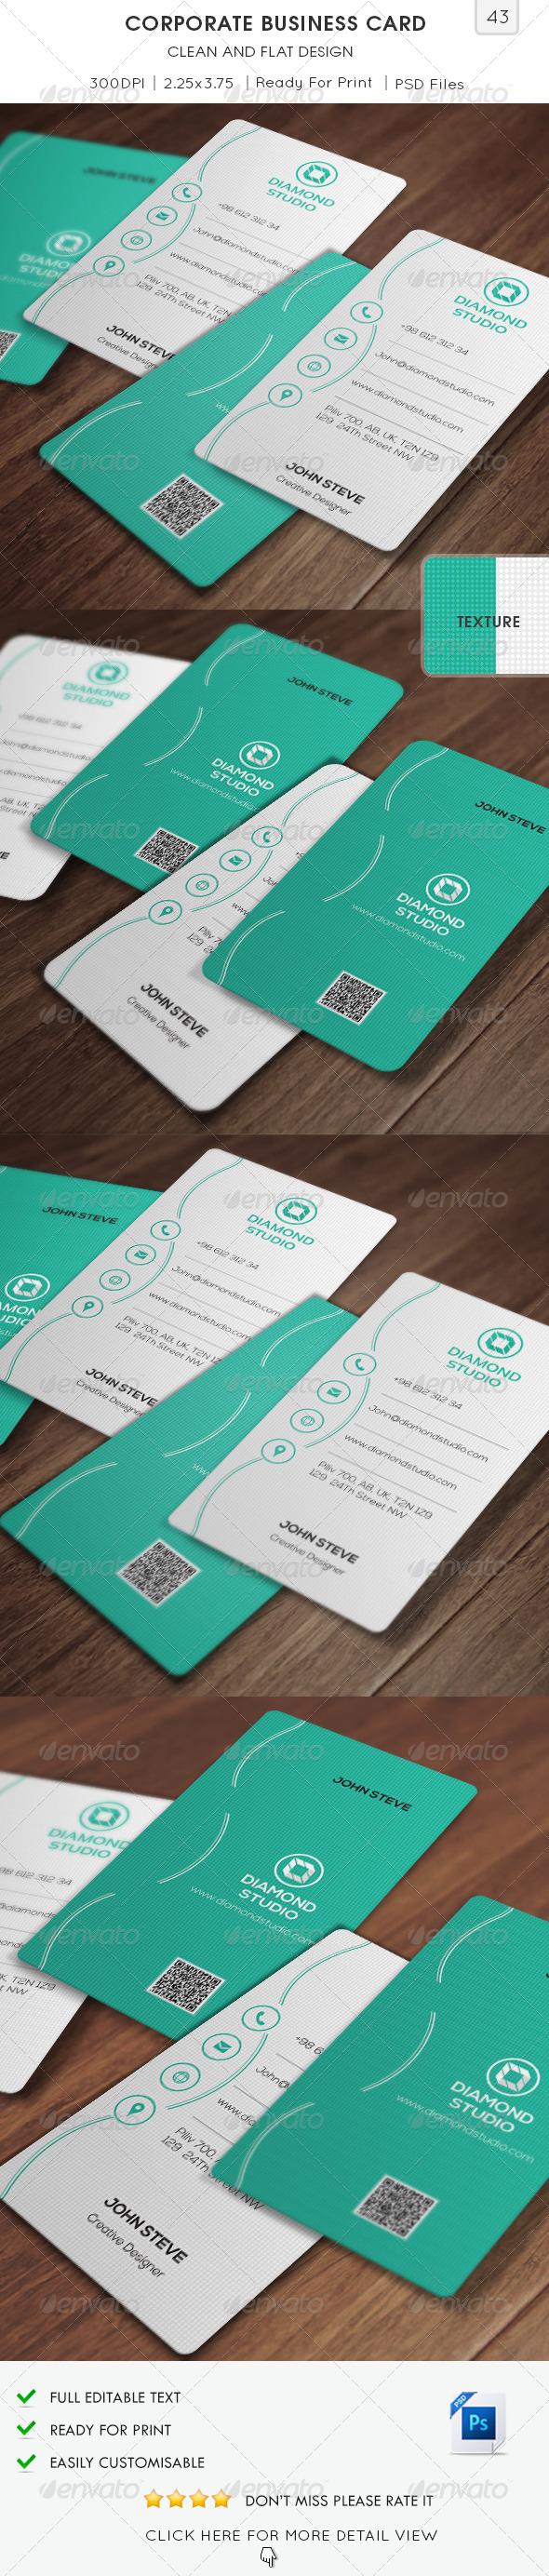 Corporate Business Card v43 - Corporate Business Cards